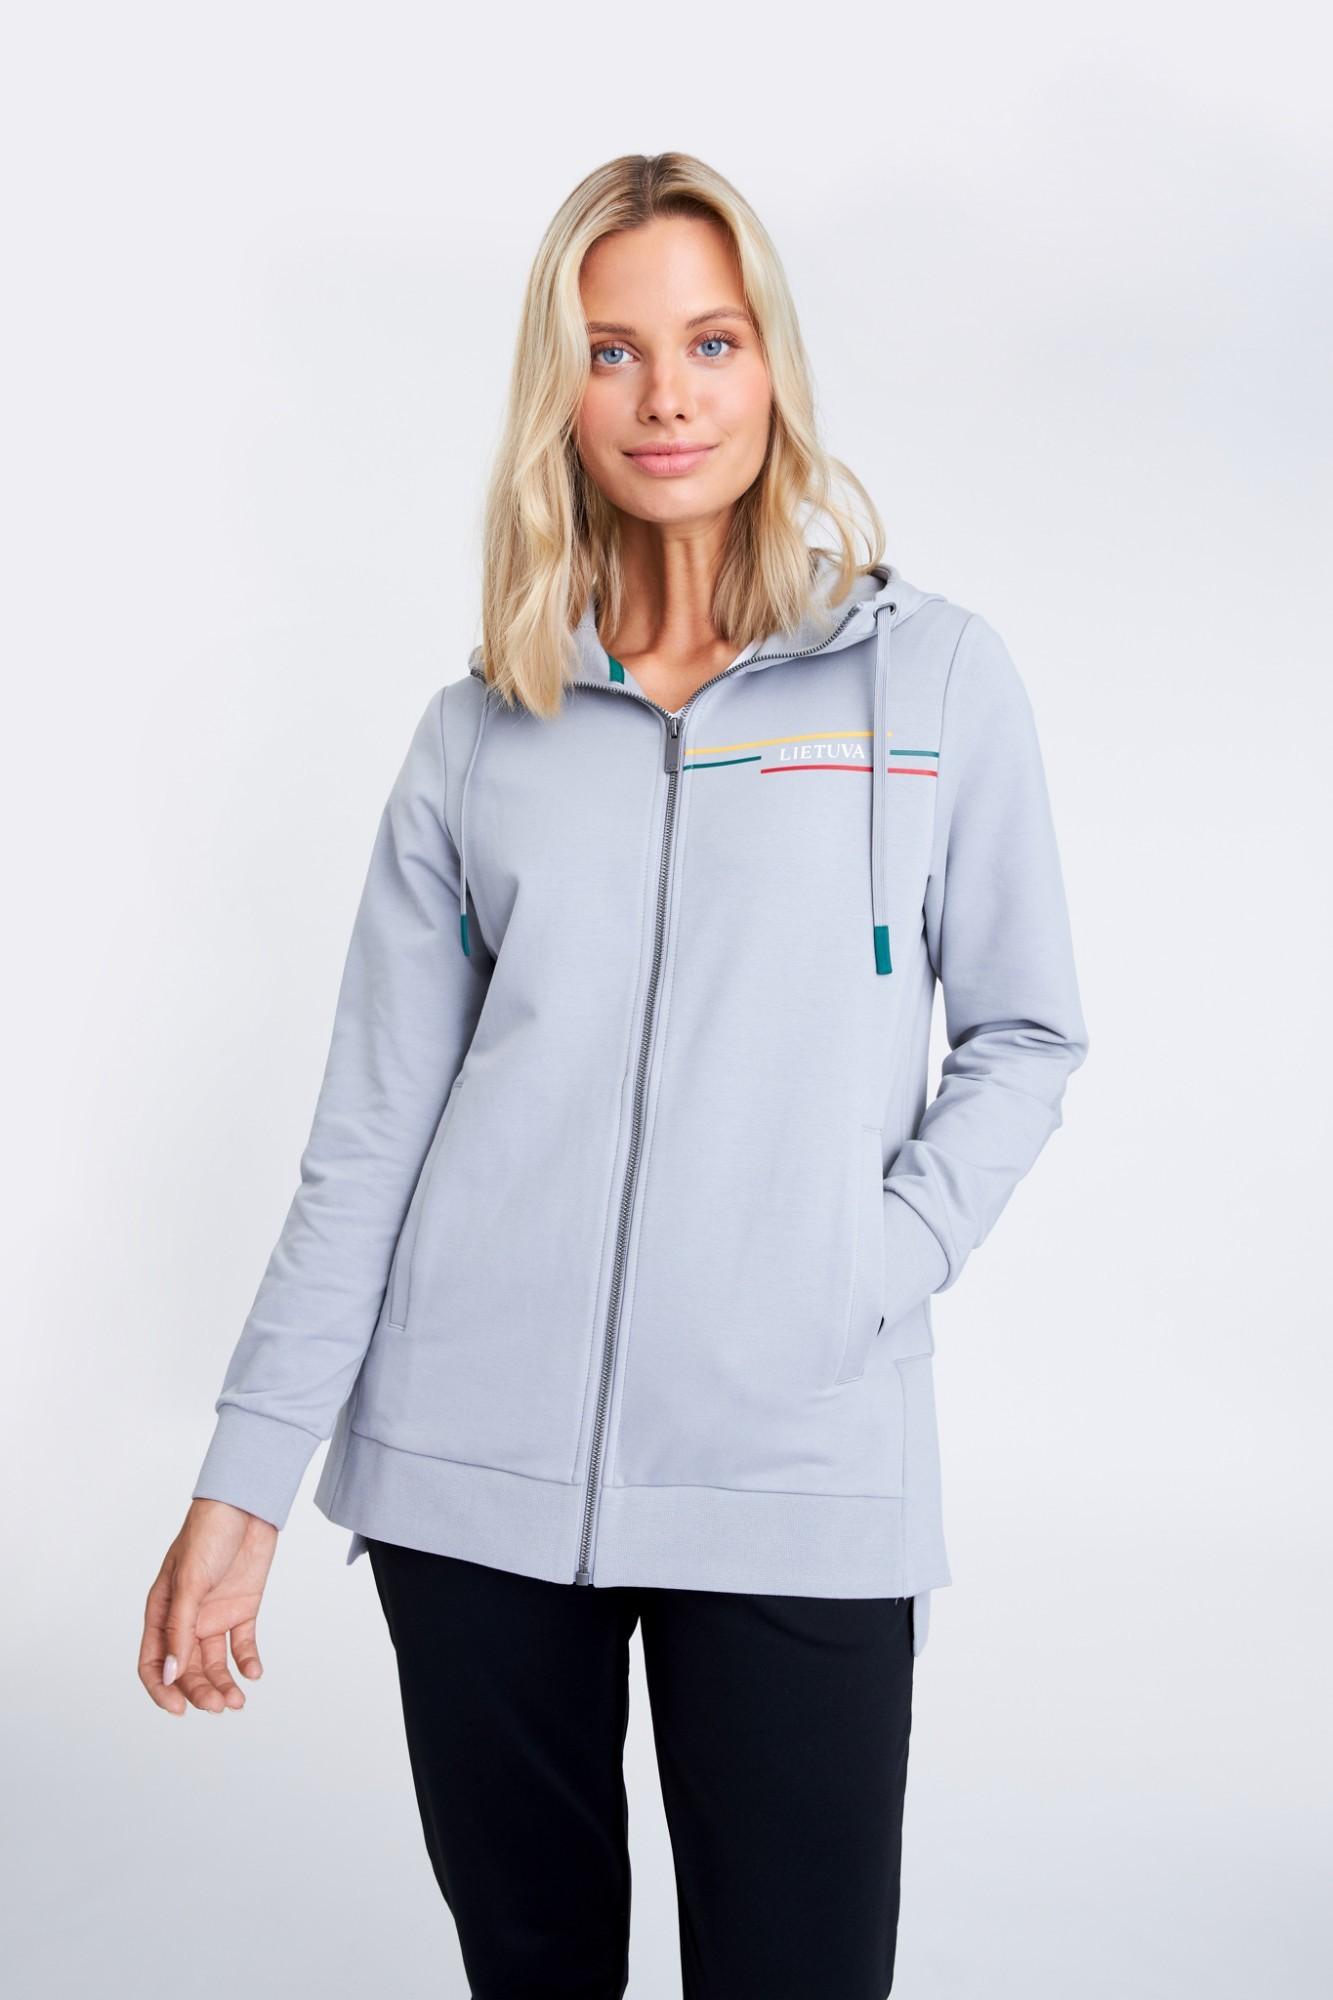 AUDIMAS Tamprus medvilninis džemperis 21LT-007 Ultimate Gray L